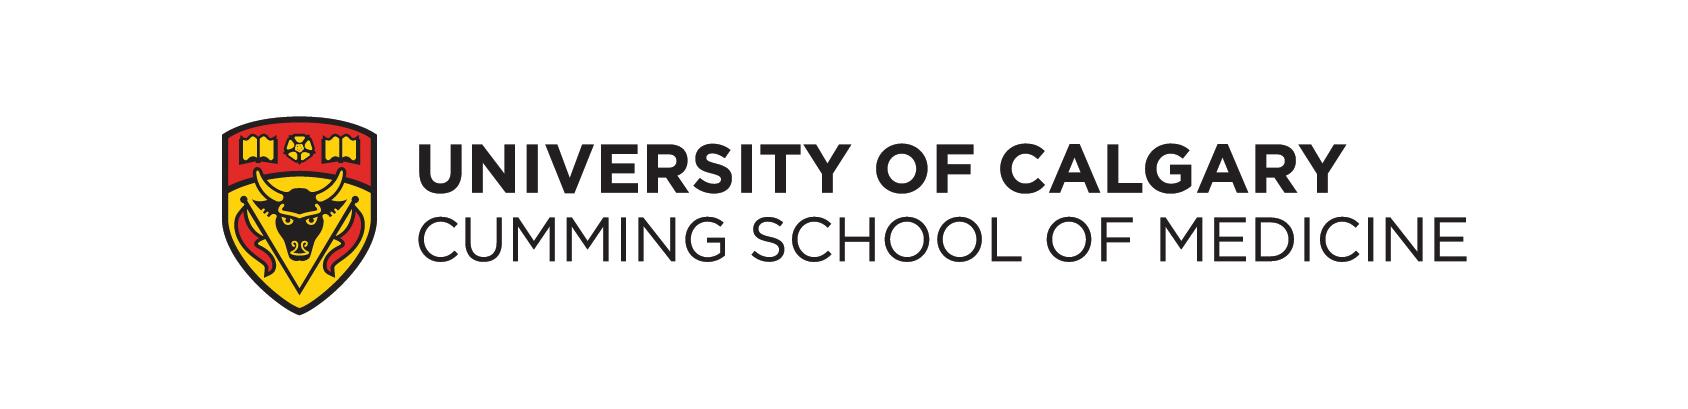 UC-cumming-rgb_sized.png